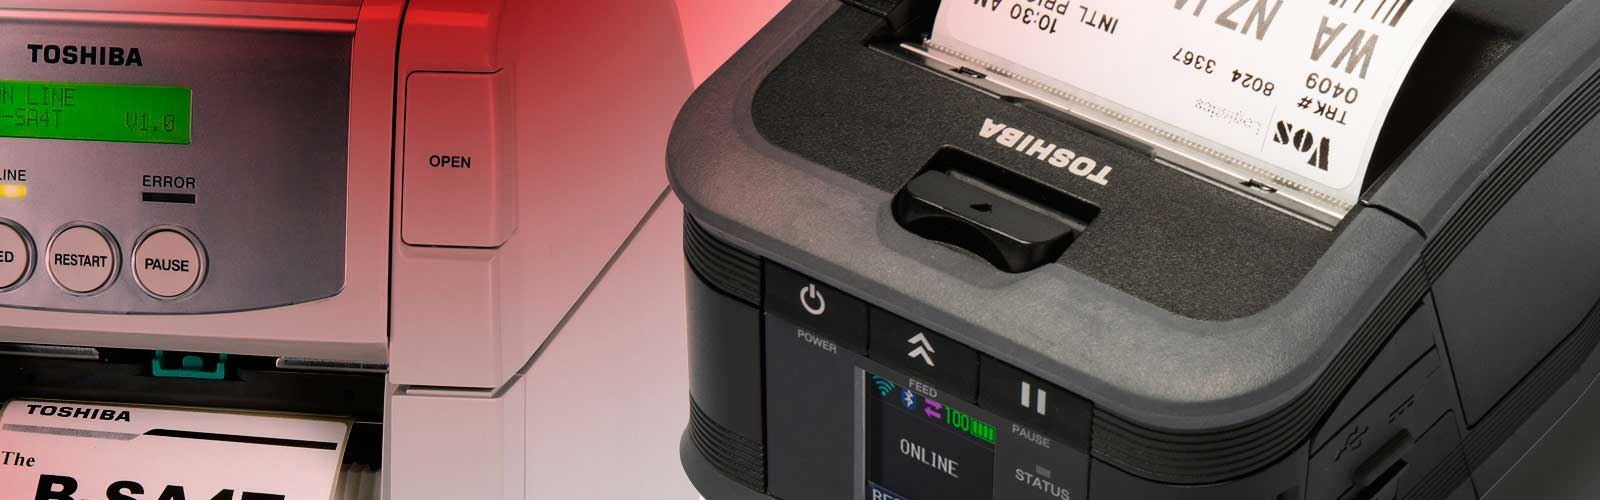 Impresoras de Etiquetas Portátiles Toshiba